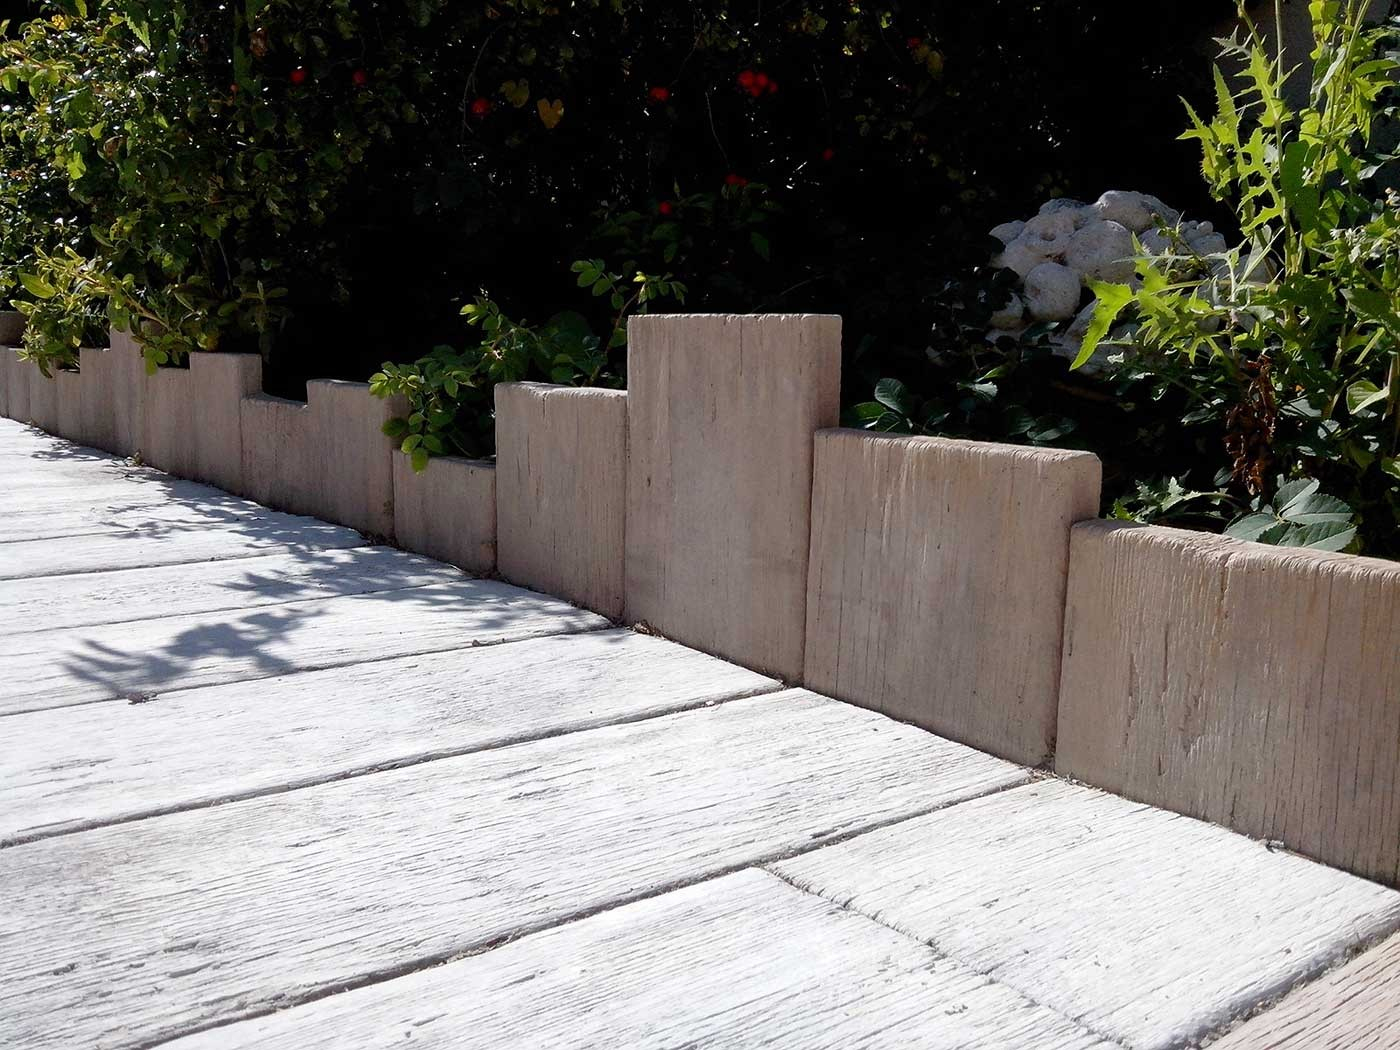 Bordure De Jardin En Pierre Reconstituée Planche Apparence ... avec Bordure Jardin Imitation Pierre